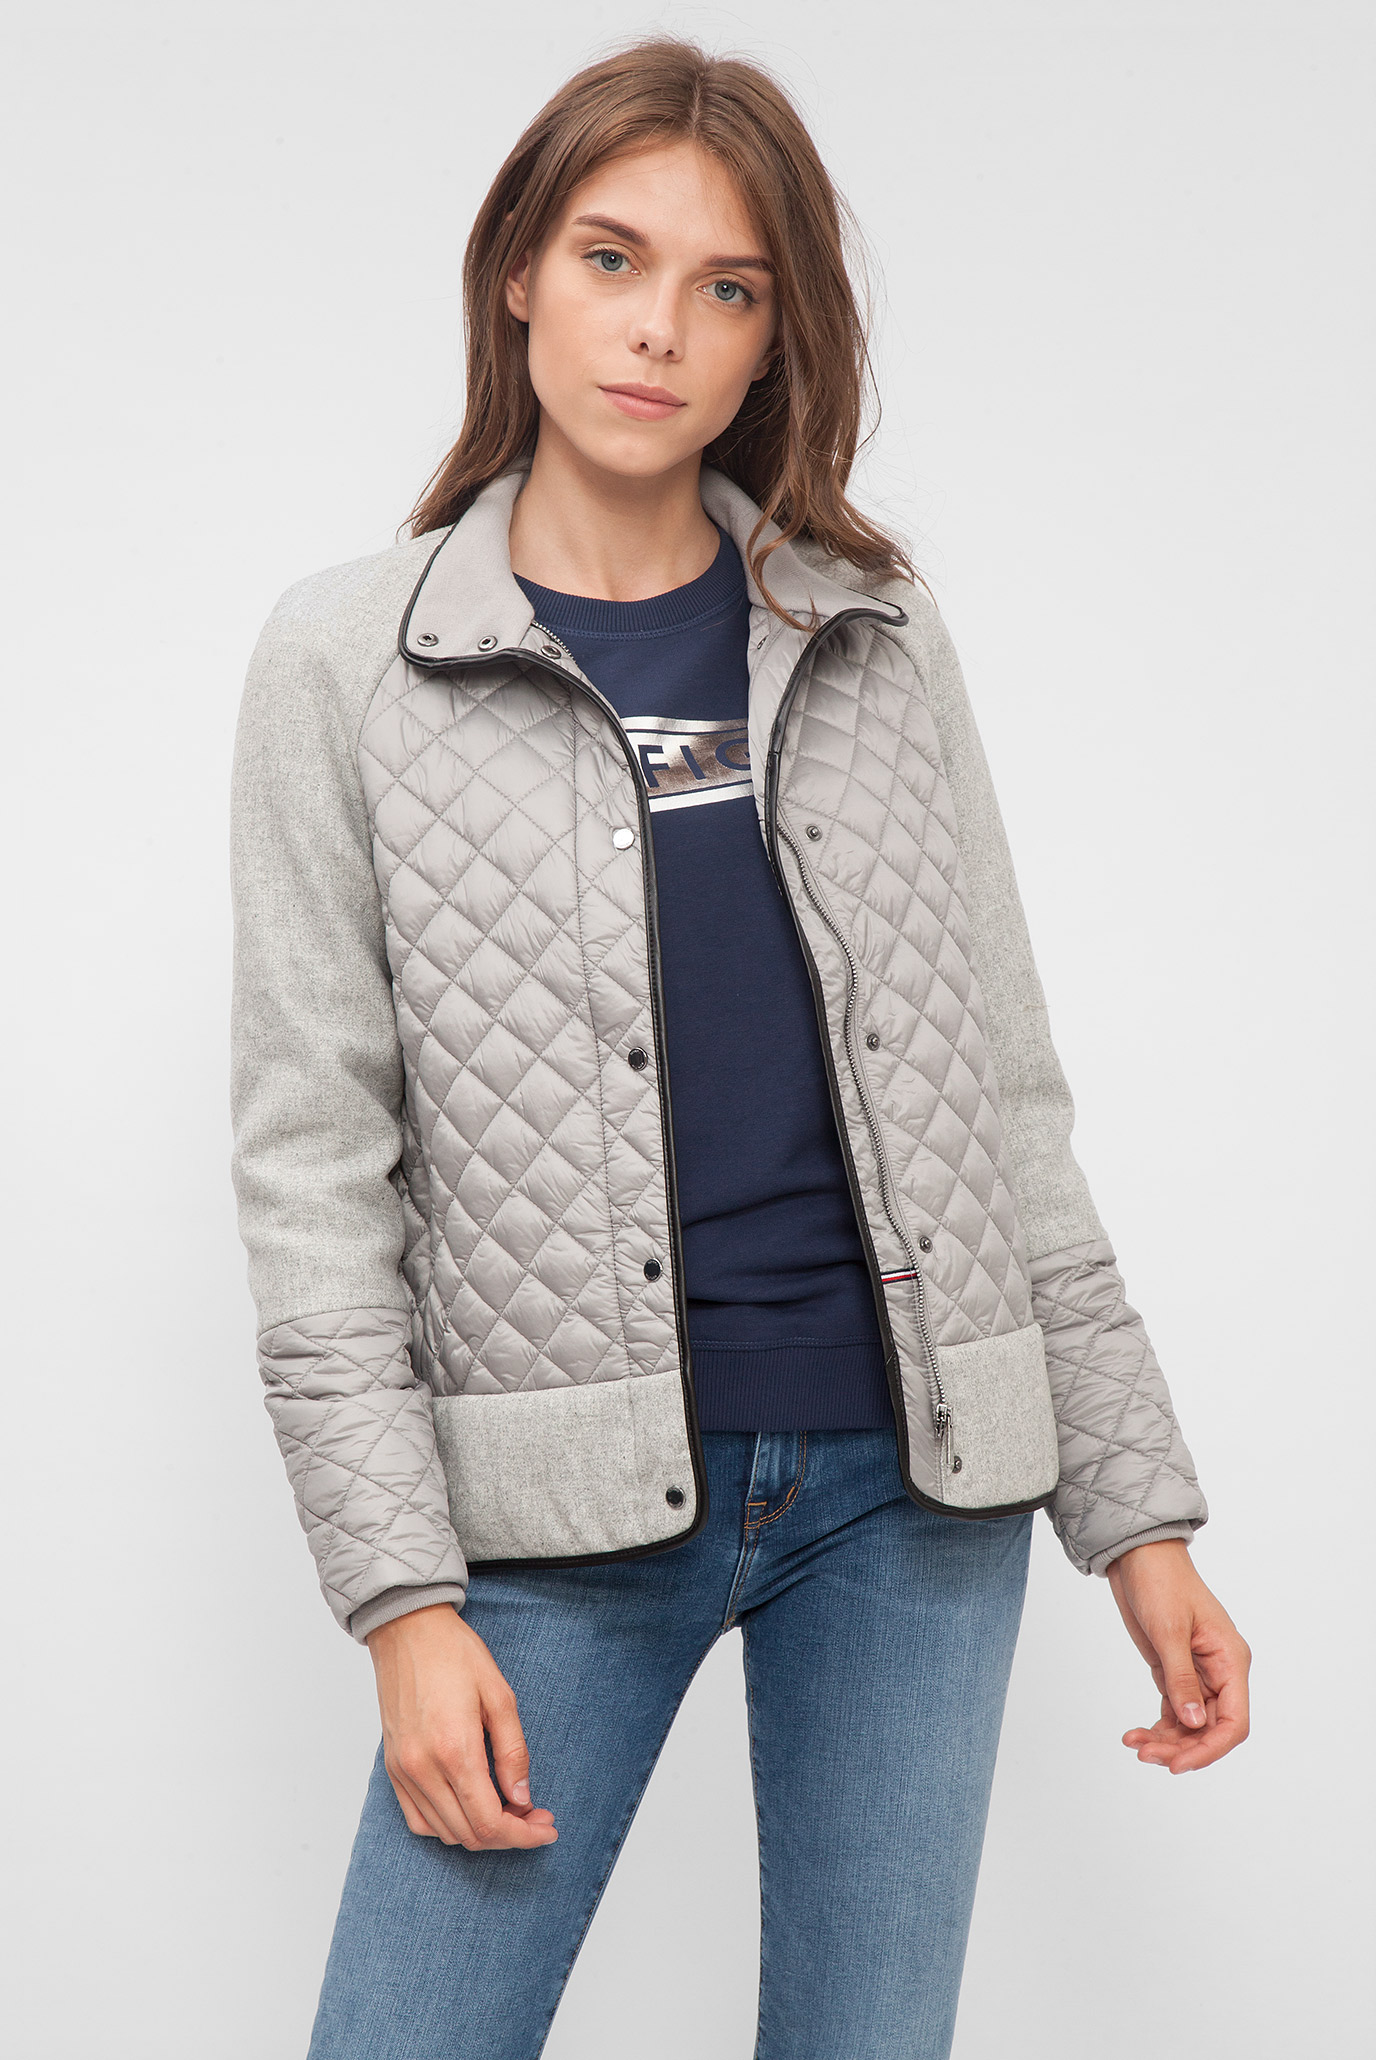 b7779fda34b Купить Женская серая стеганая куртка Tommy Hilfiger Tommy Hilfiger  WW0WW18867 – Киев